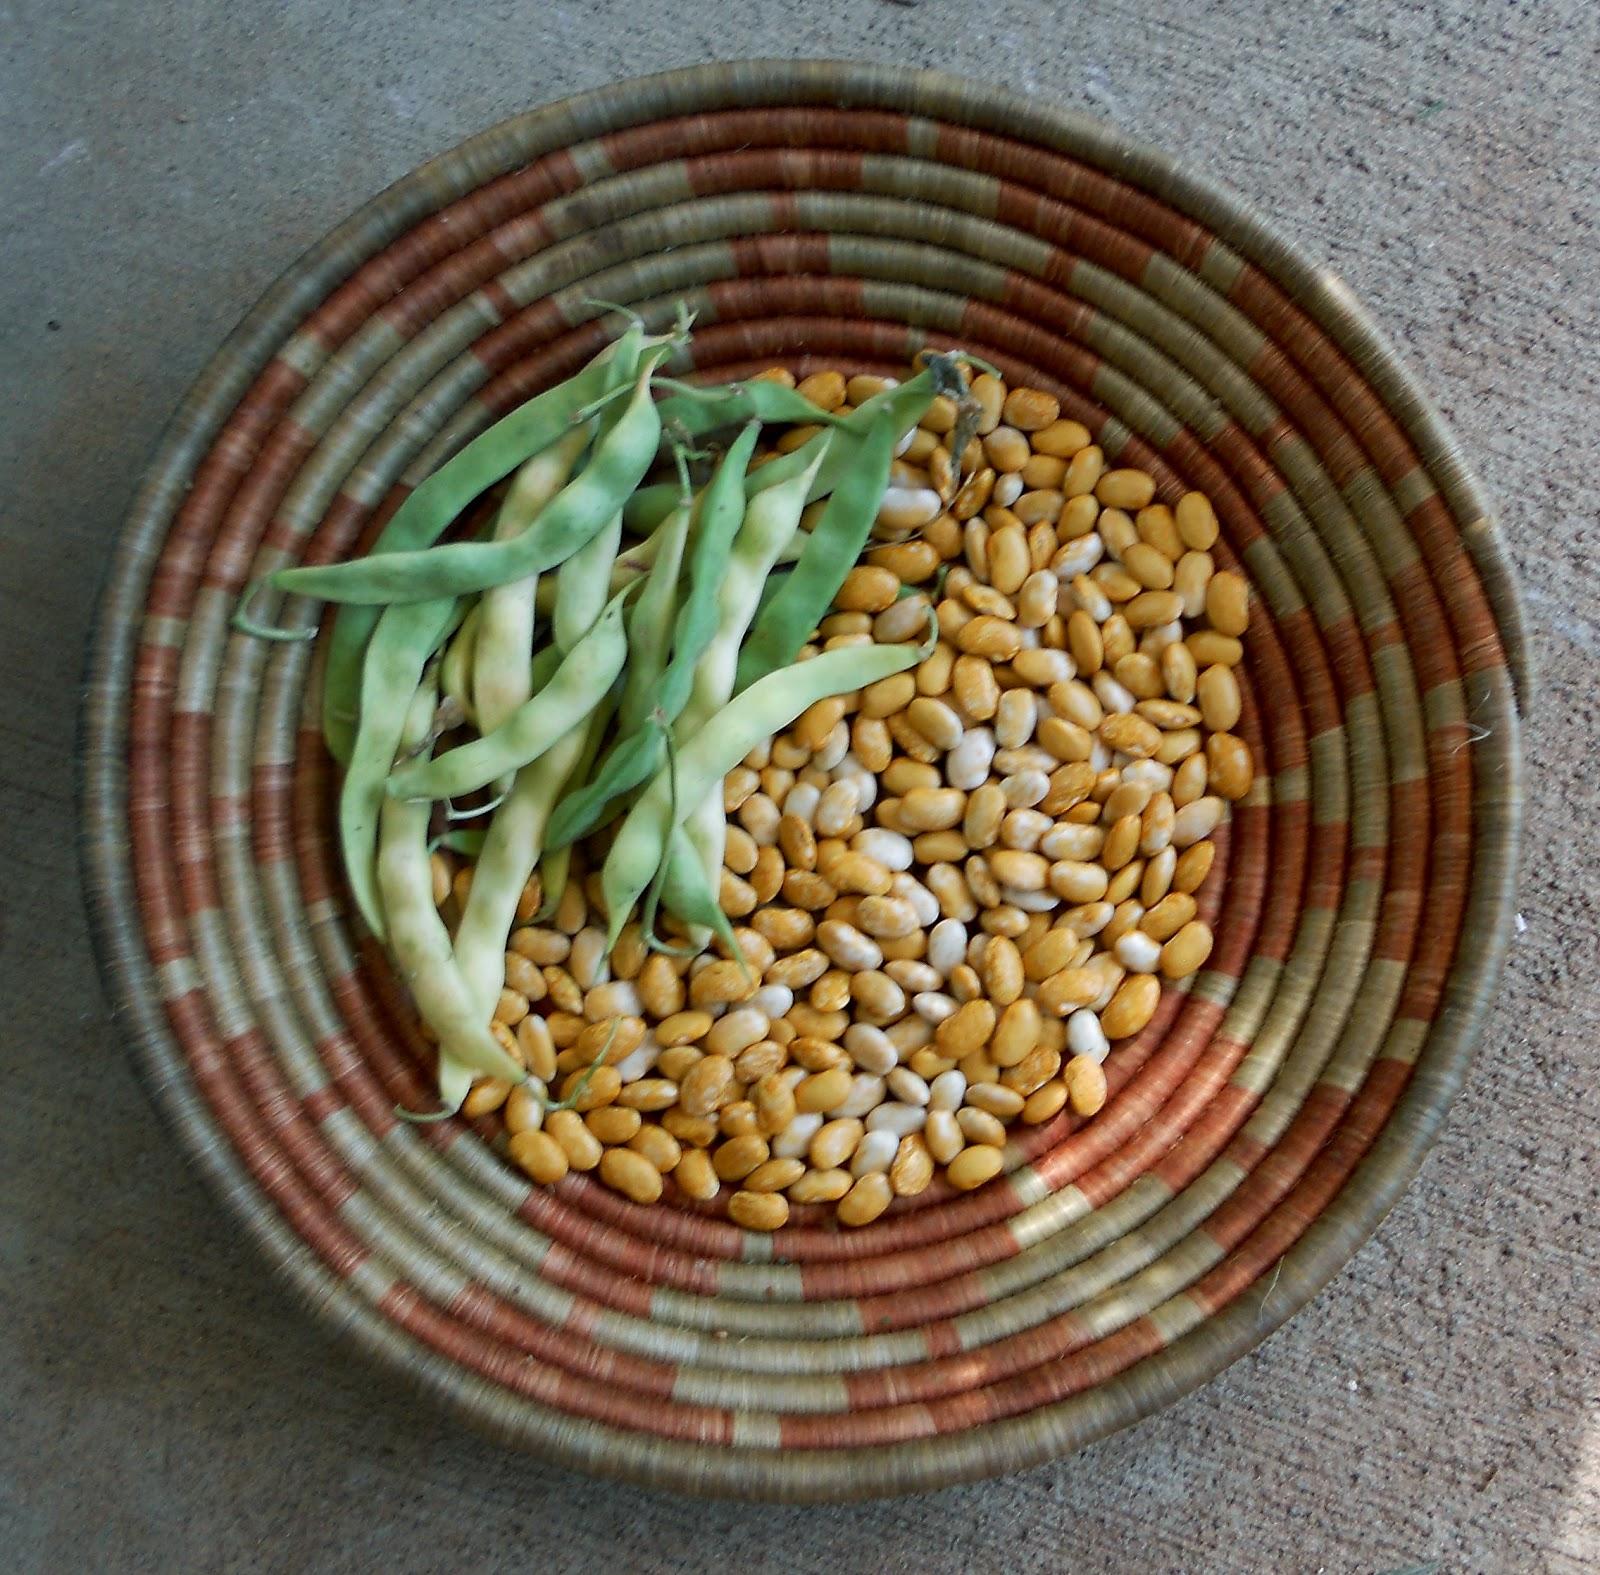 A Kitchen Garden in Kihei Maui: Growing High & Low Desert Heirloom Beans